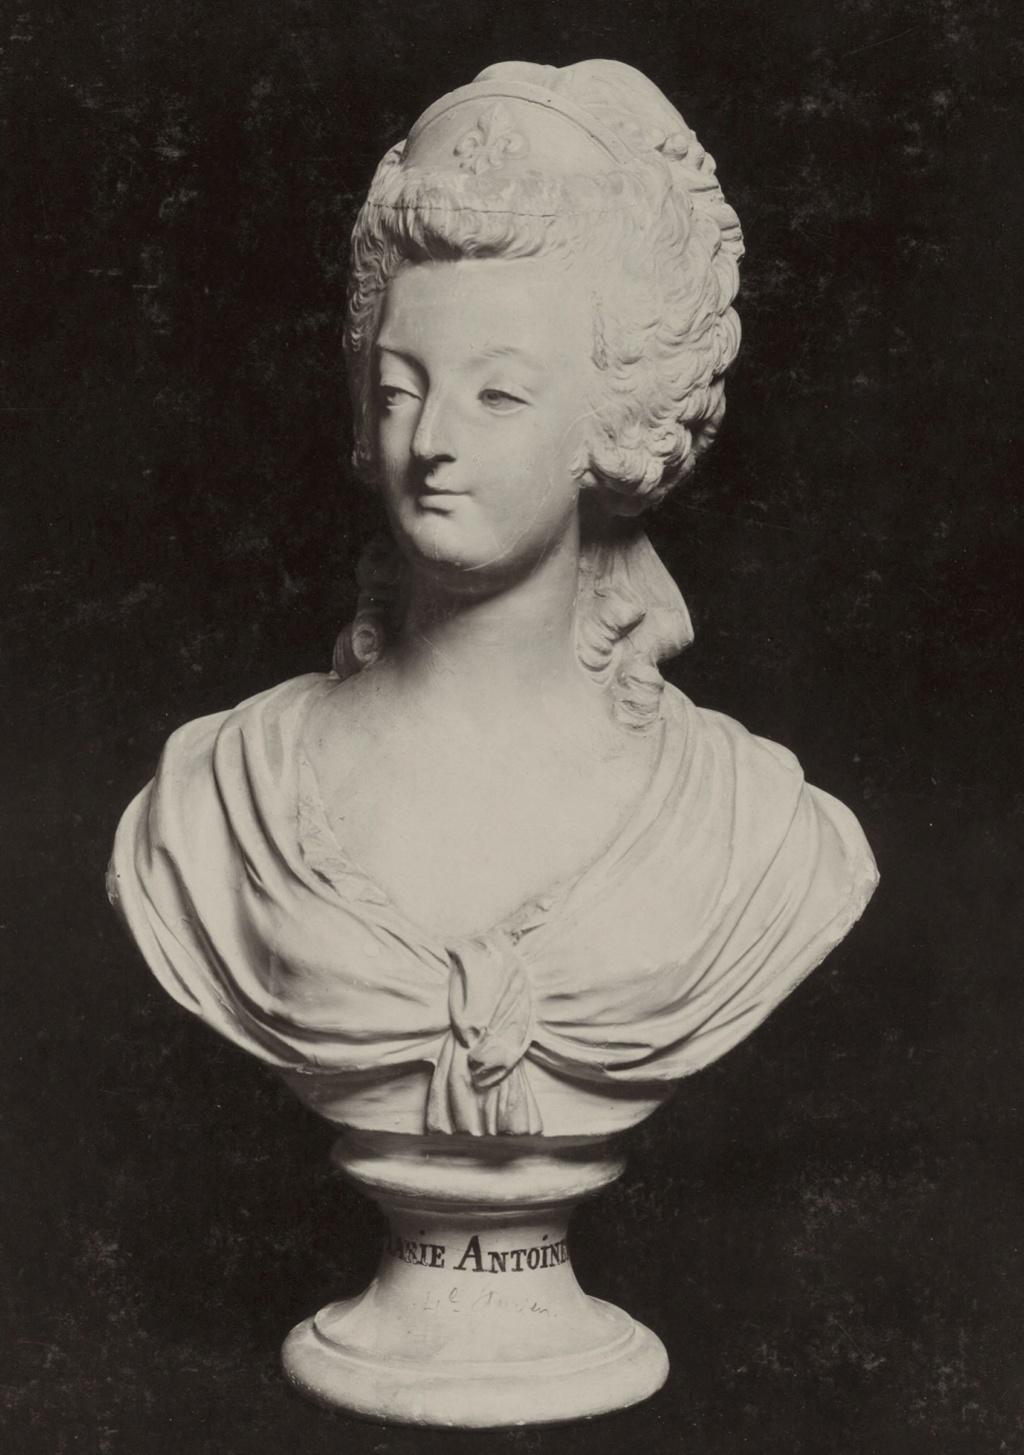 Buste de Marie-Antoinette d'après Brachard (Jean-Charles ou Jean-Nicolas) Bracha10